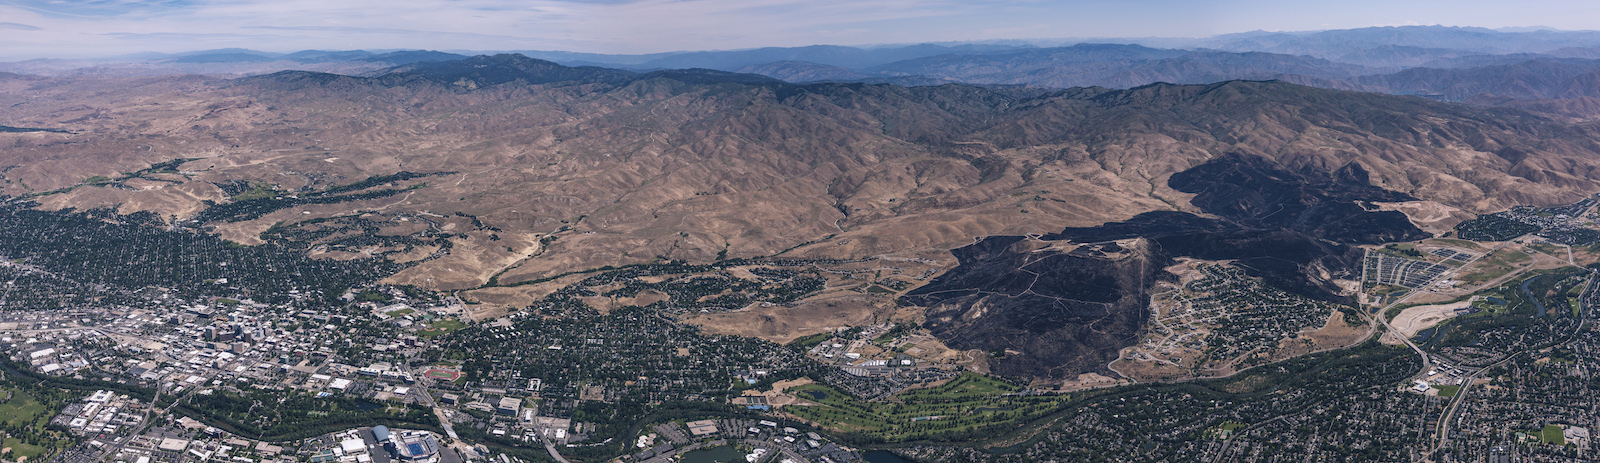 Panorama of fire devastation